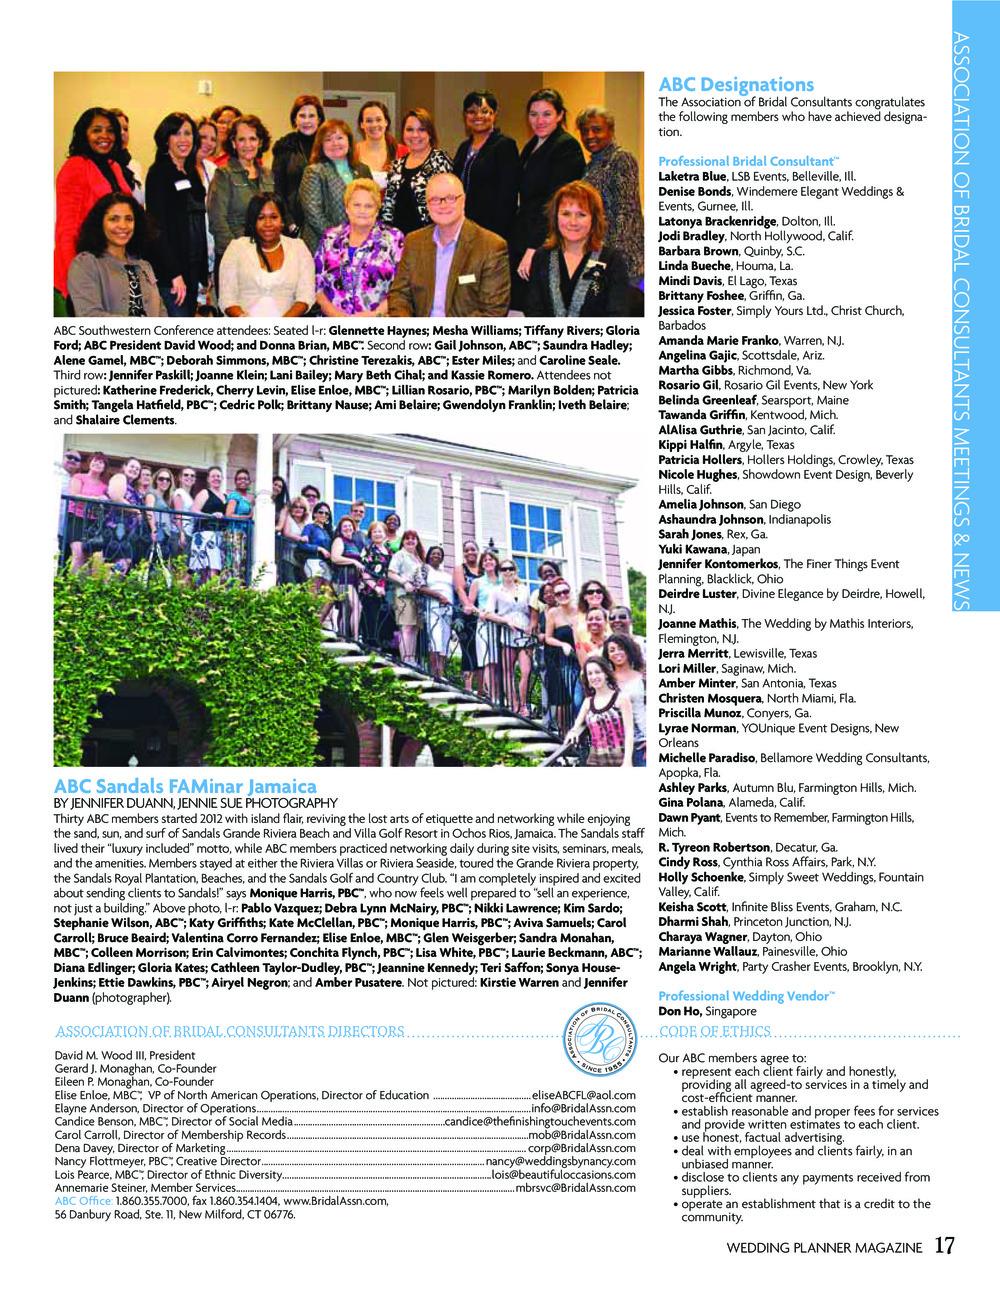 Wedding Planner Mag June 2012 Vol 2 Iss 2-page-16 (2).jpg